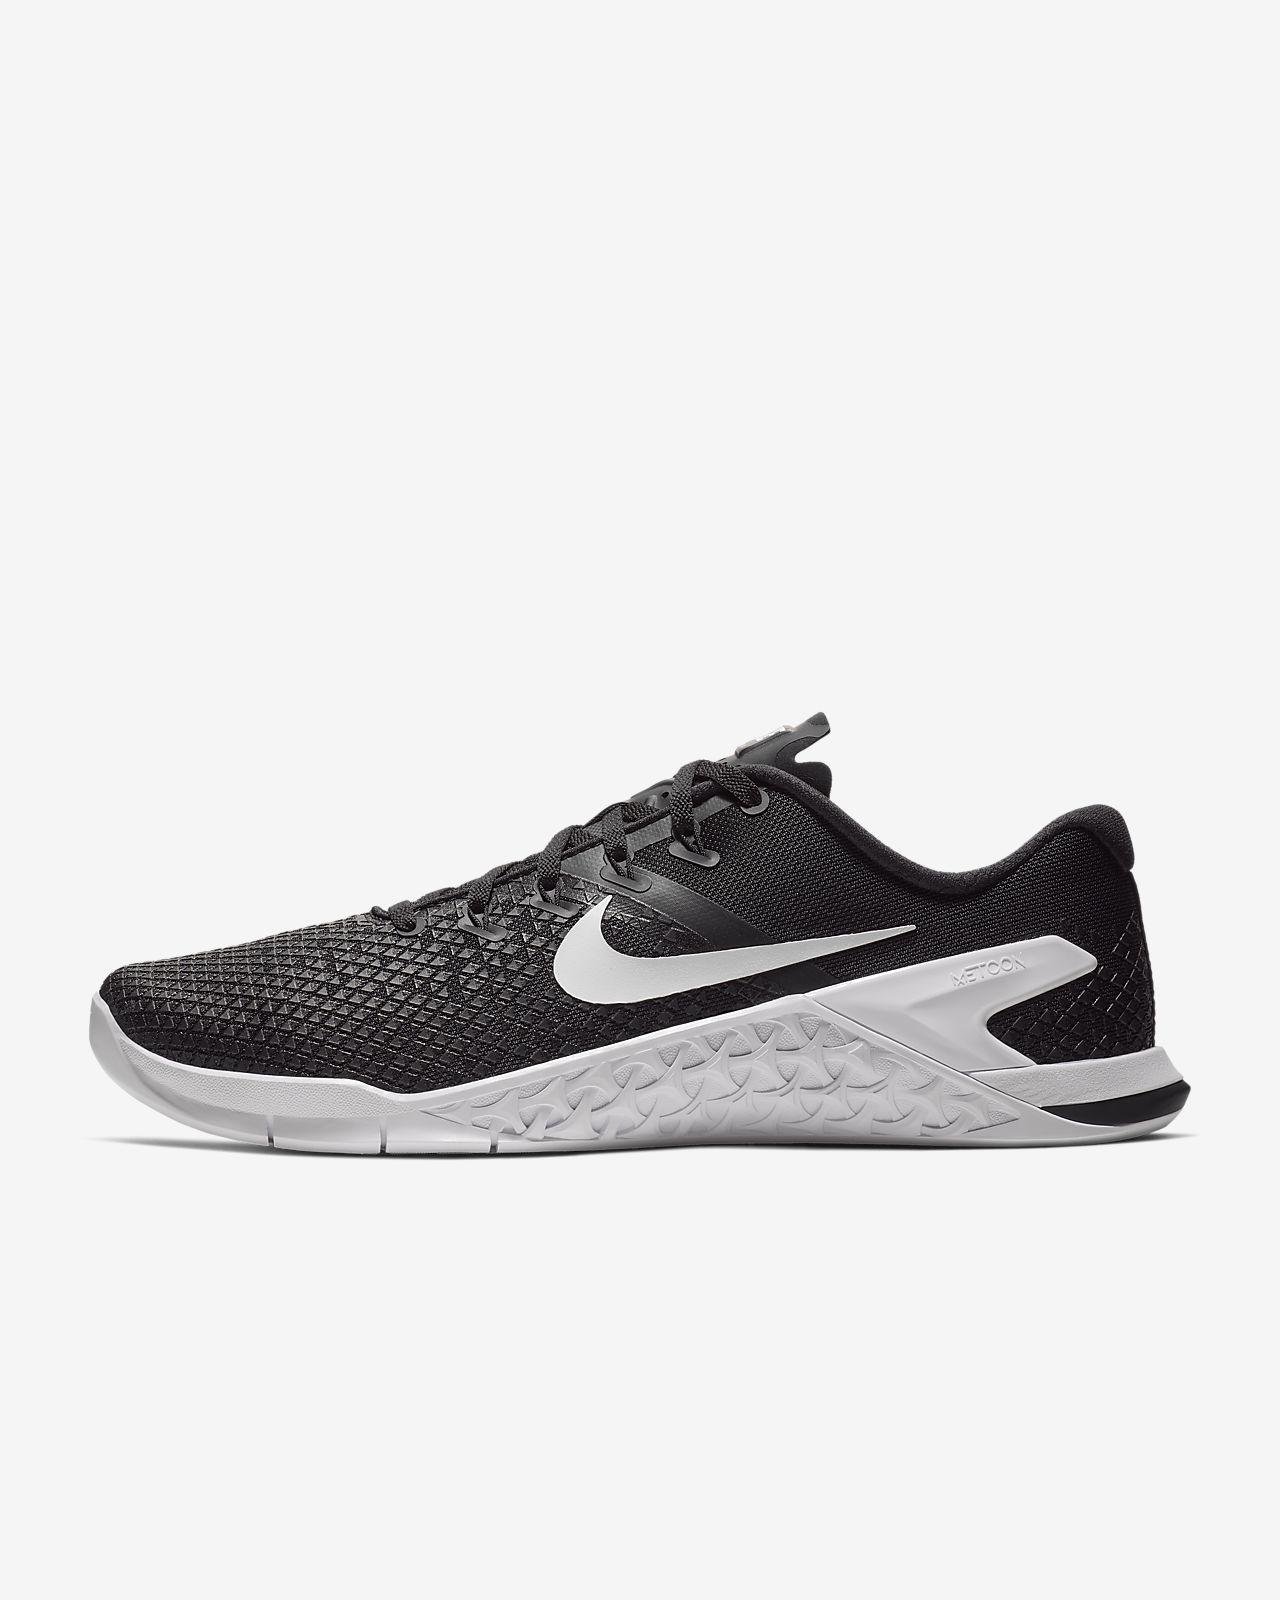 sports shoes e06a7 c804b ... Chaussure de training Nike Metcon 4 XD pour Homme